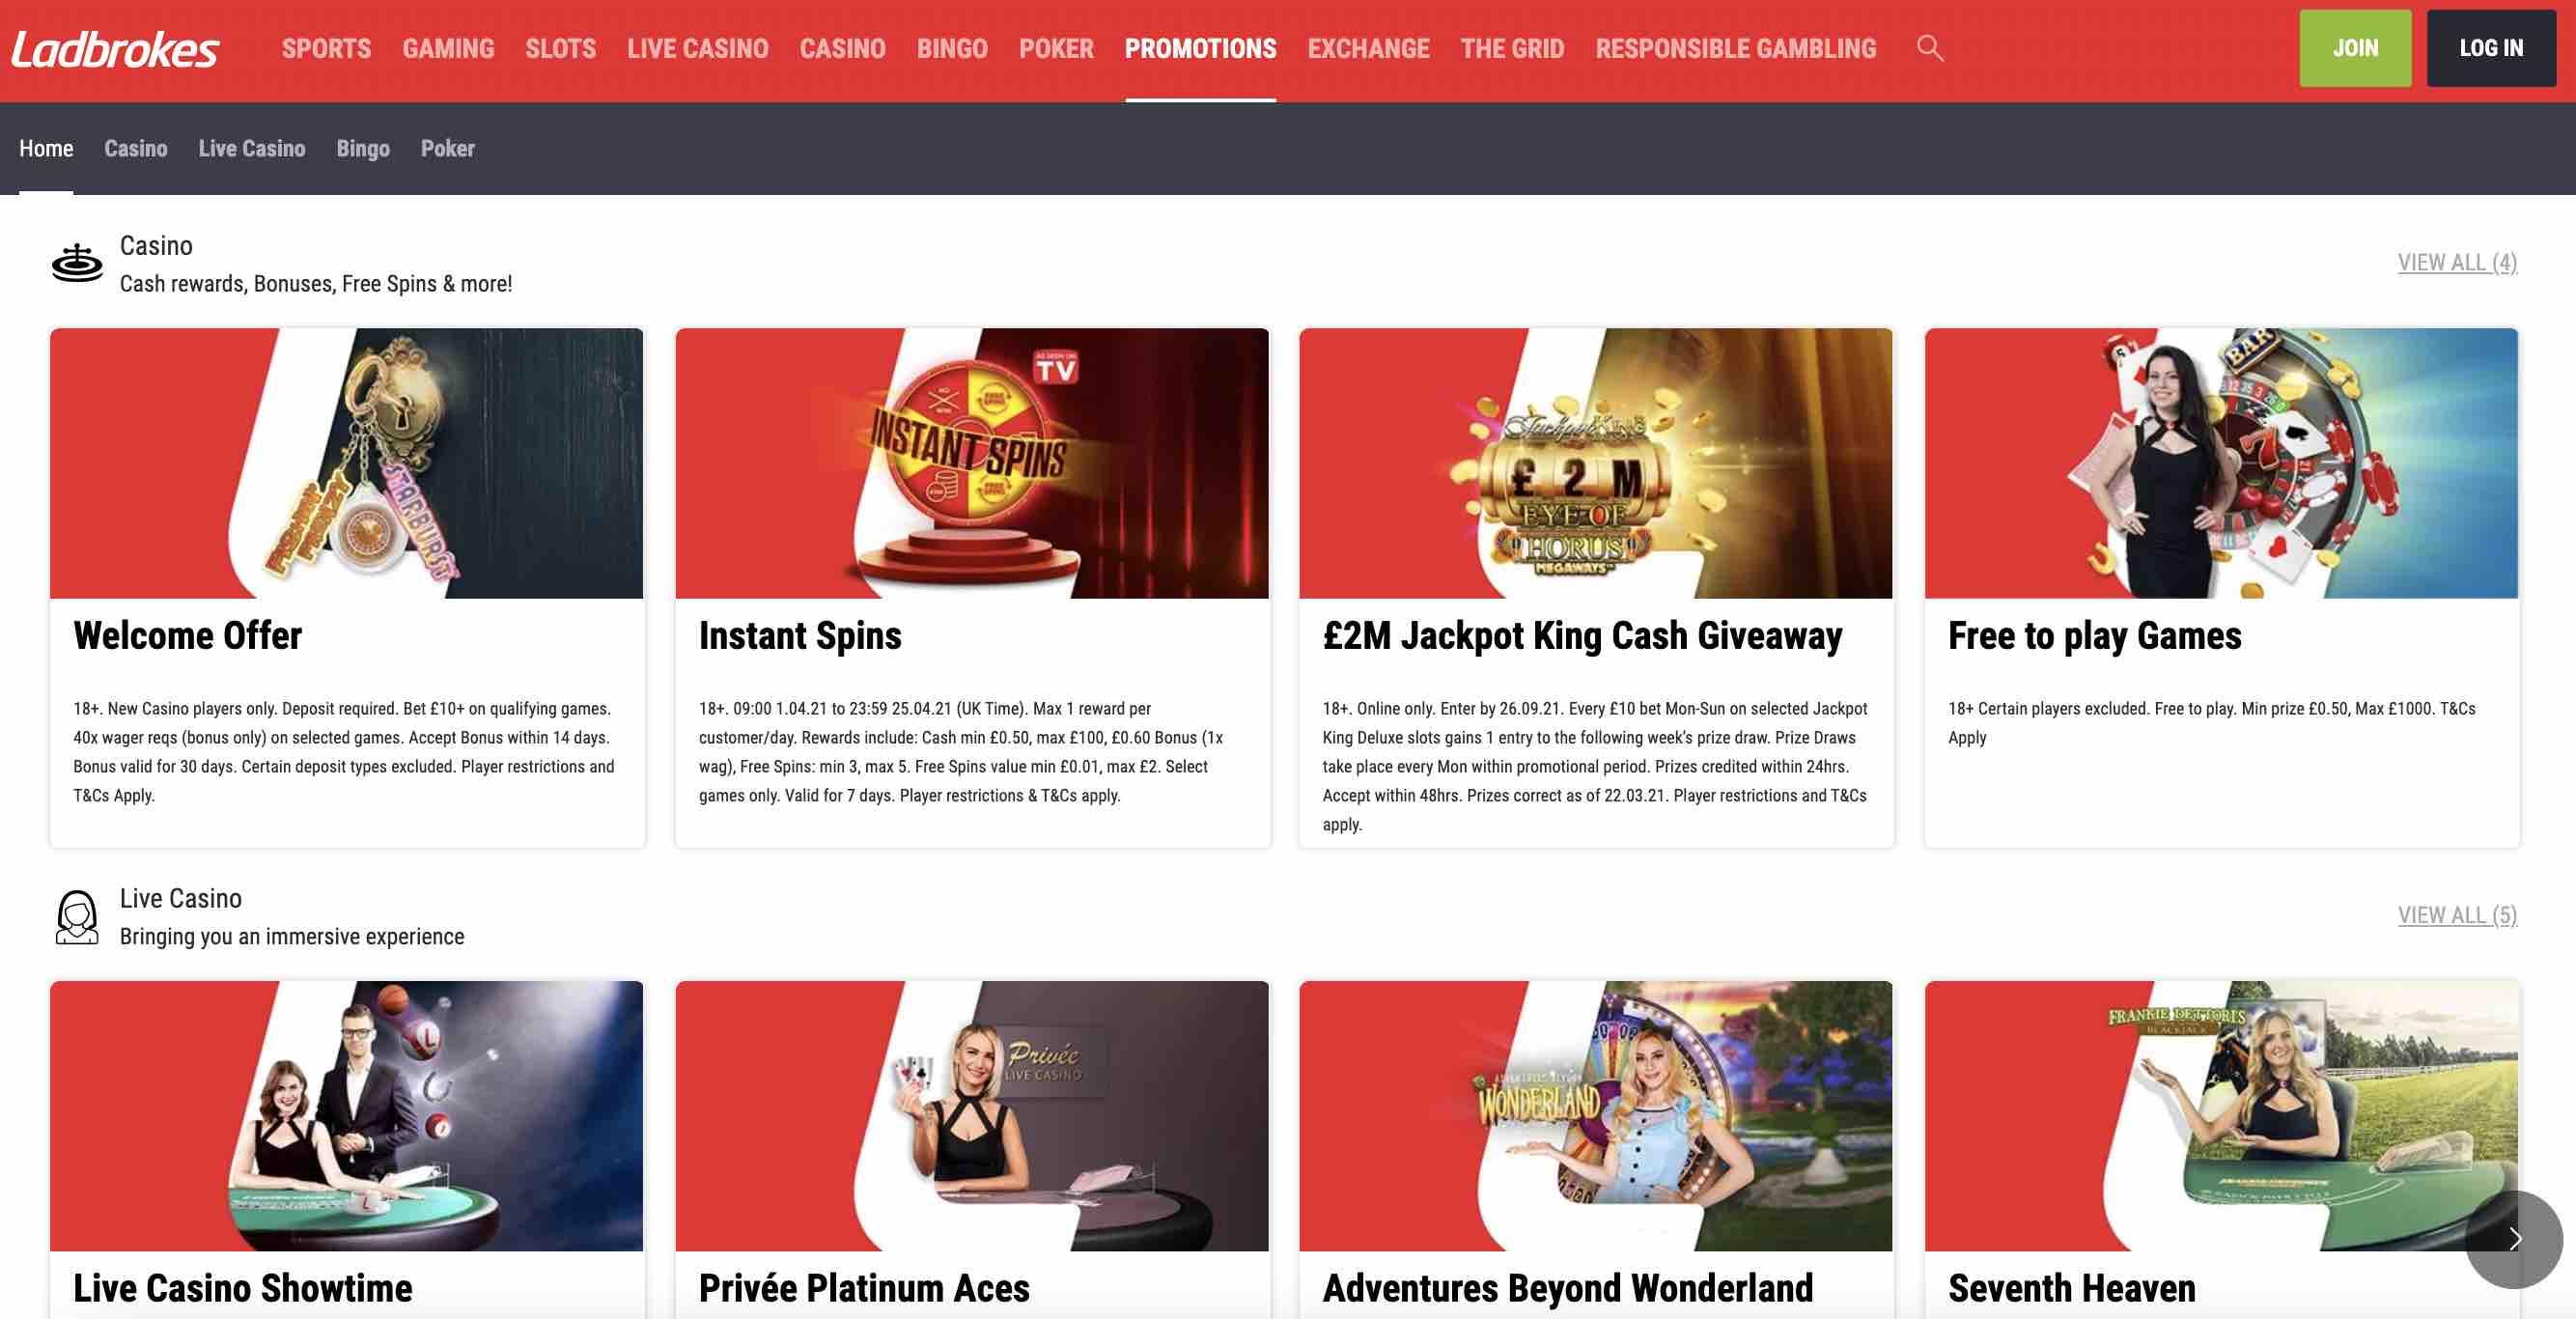 Bonuses at Ladbrokes Casino